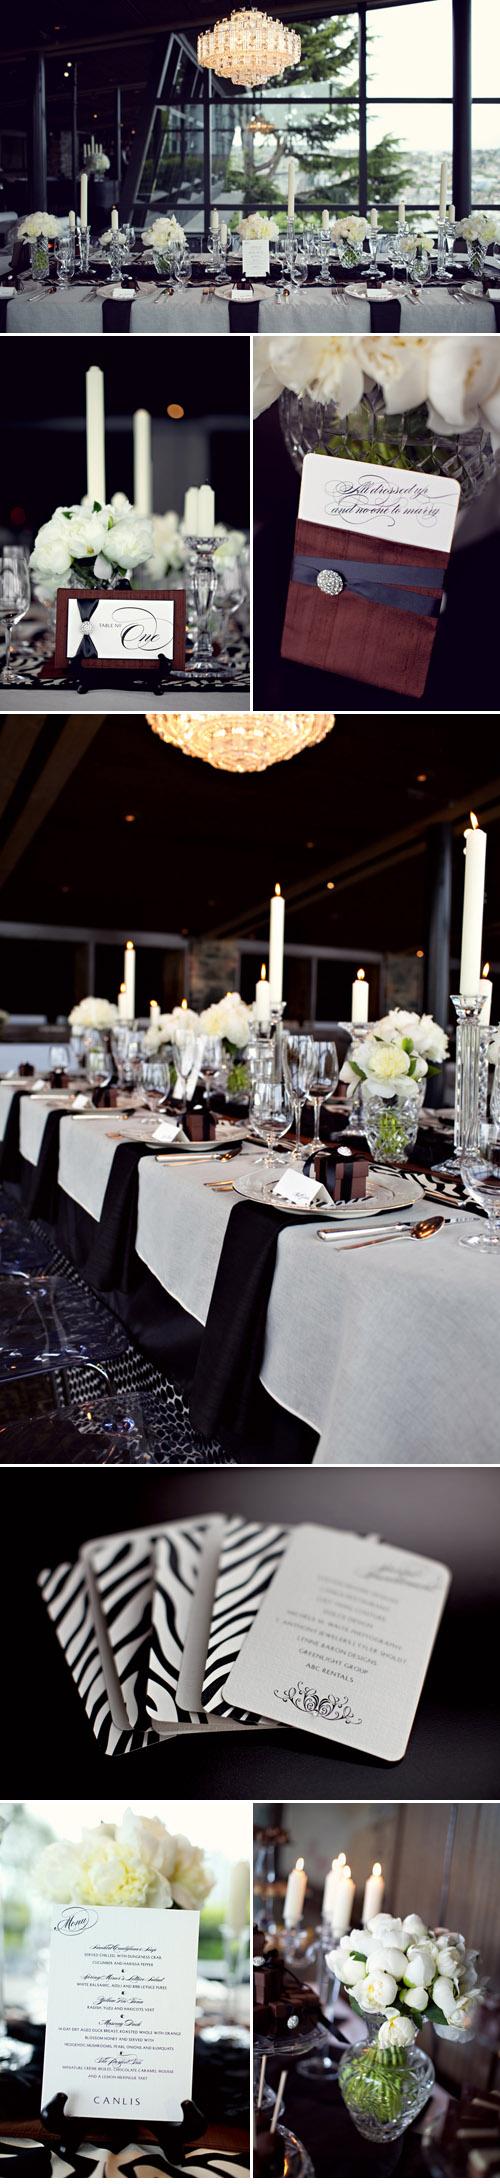 swanky and elegant wedding style at canlis junebug weddings. Black Bedroom Furniture Sets. Home Design Ideas